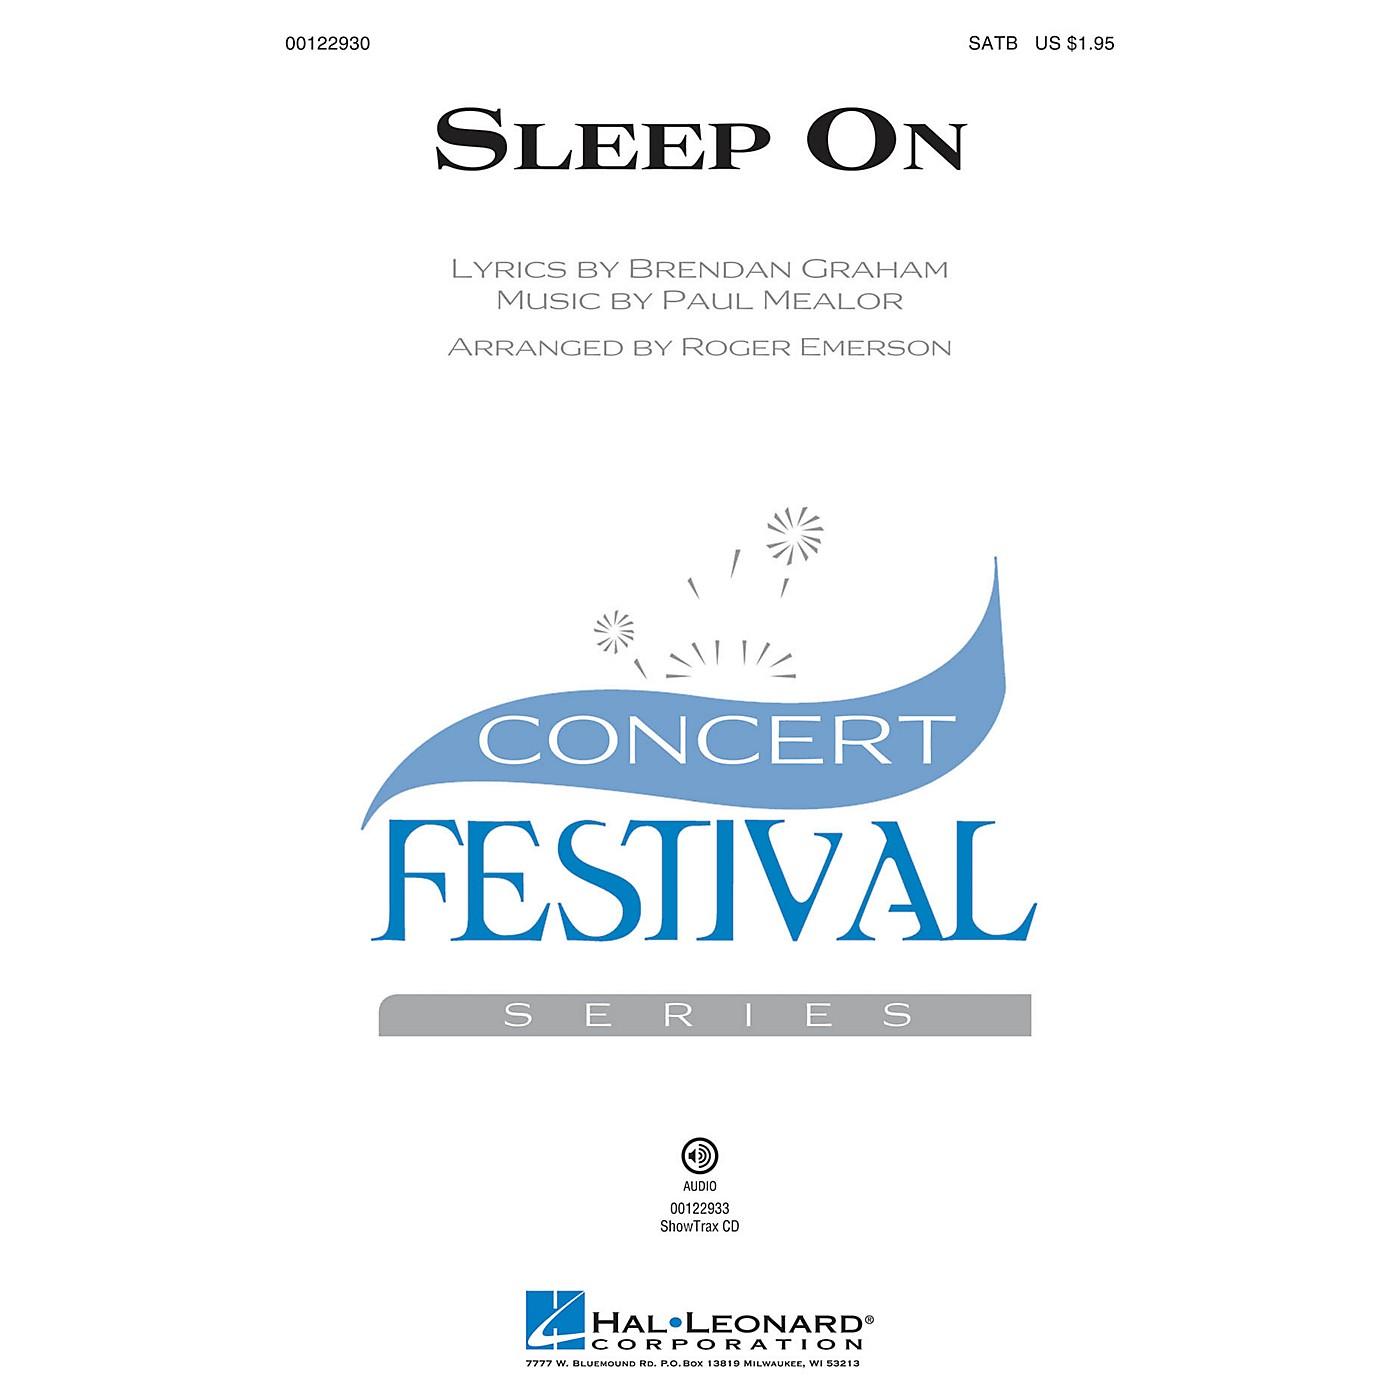 Hal Leonard Sleep On ShowTrax CD by Hayley Westenra Arranged by Roger Emerson thumbnail